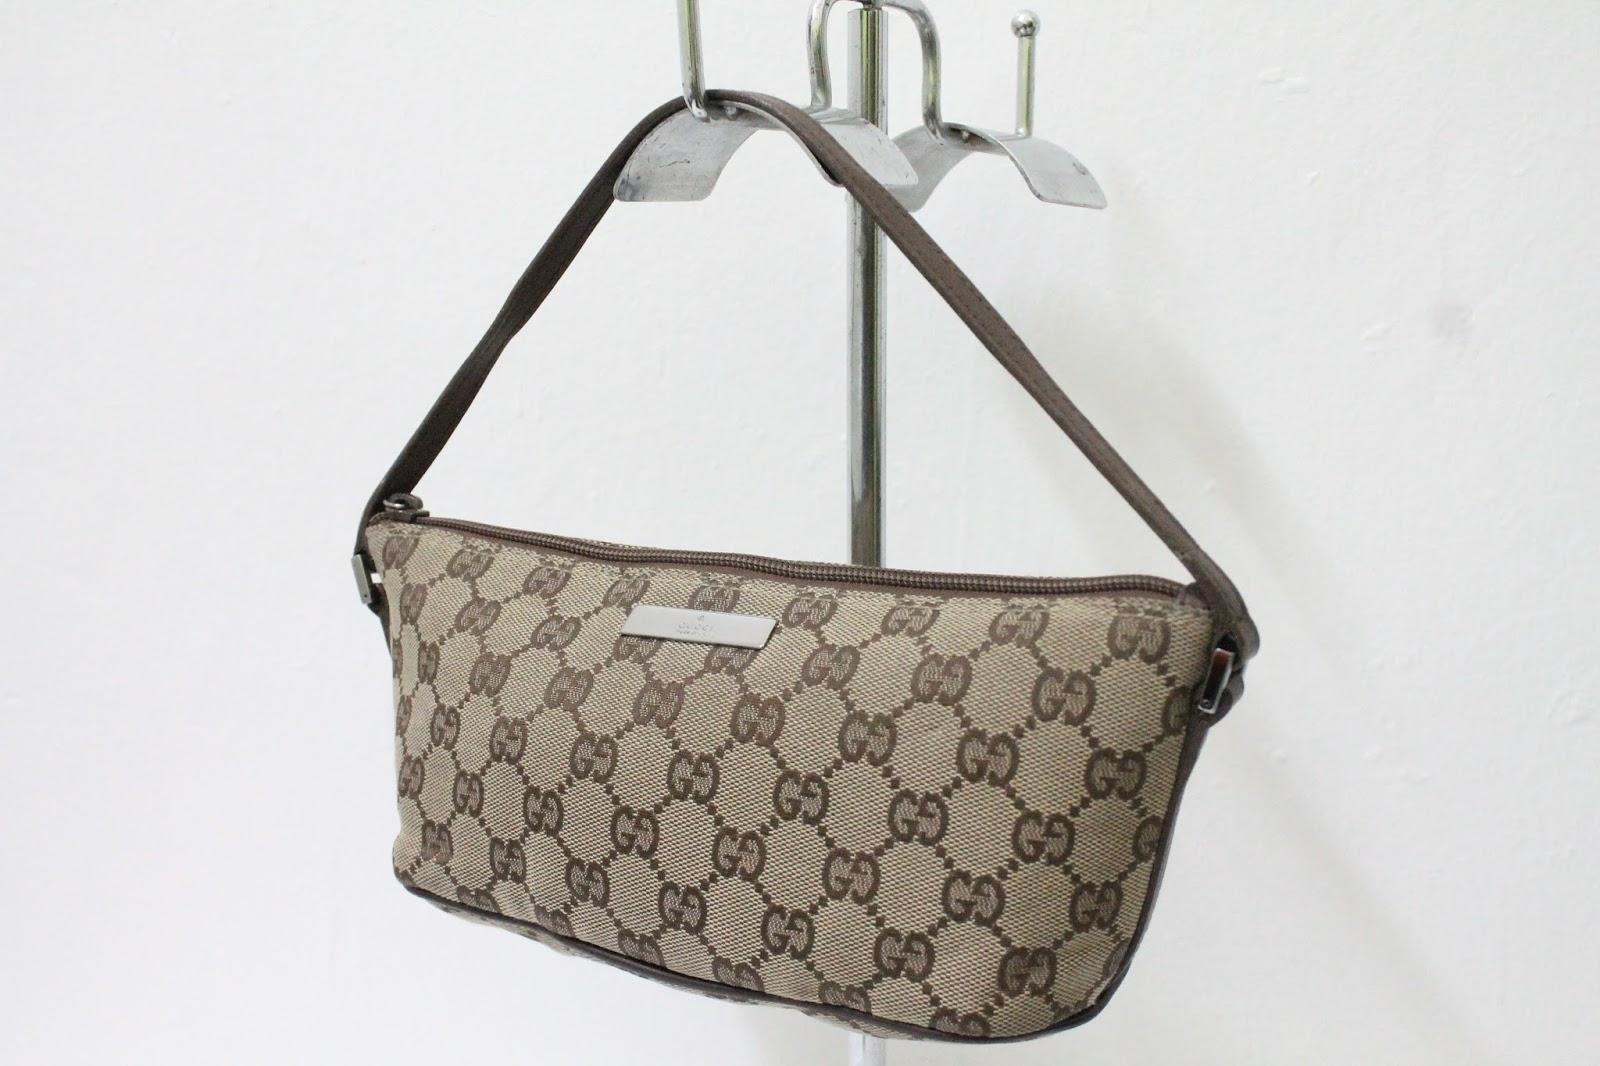 bundlebarangbaek authentic gucci tote bag. Black Bedroom Furniture Sets. Home Design Ideas